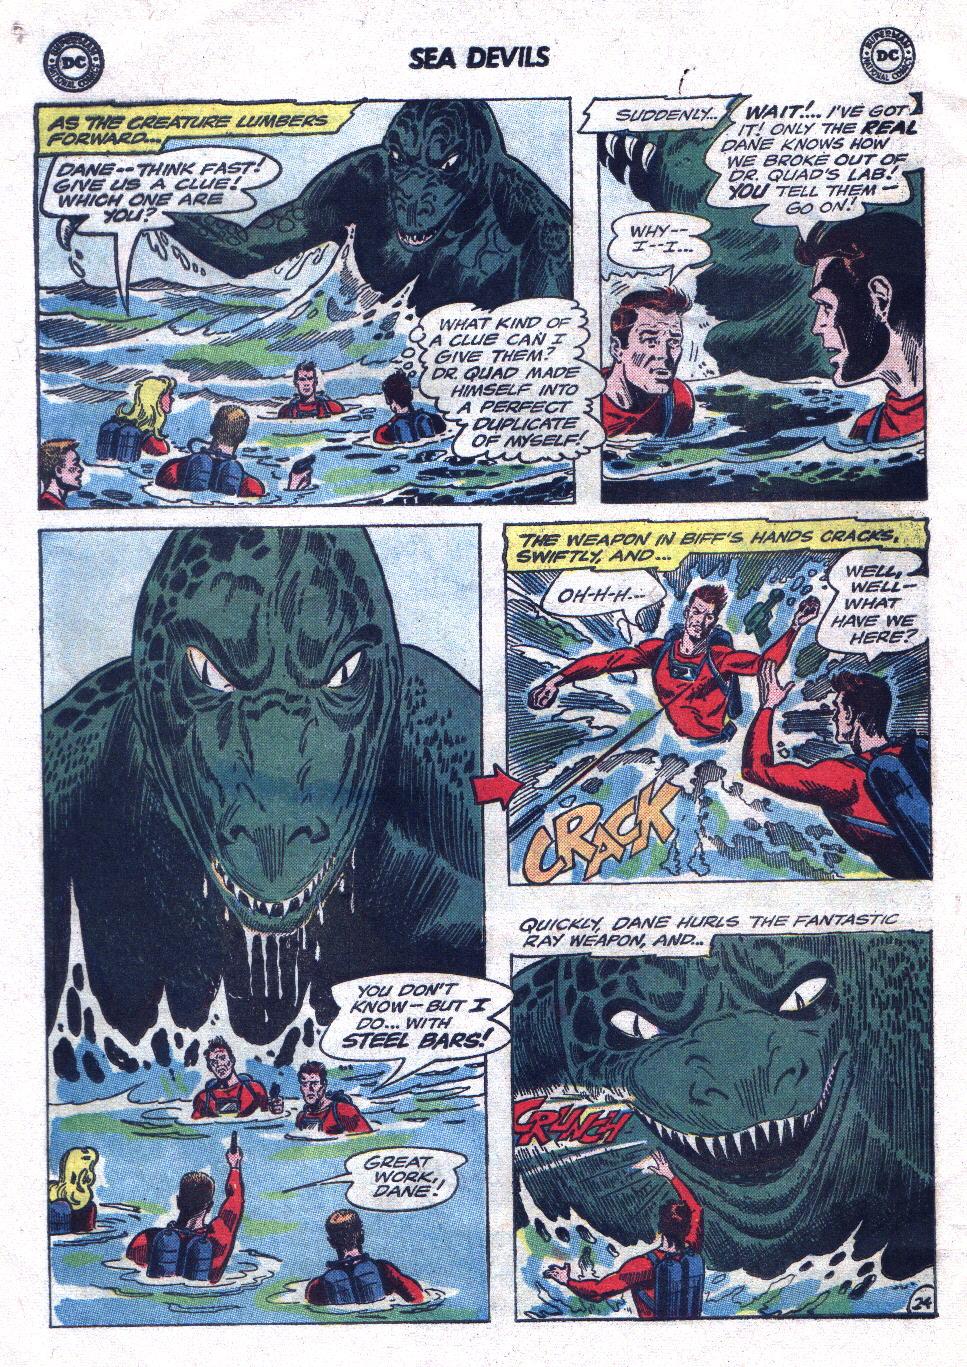 Read online Sea Devils comic -  Issue #21 - 32